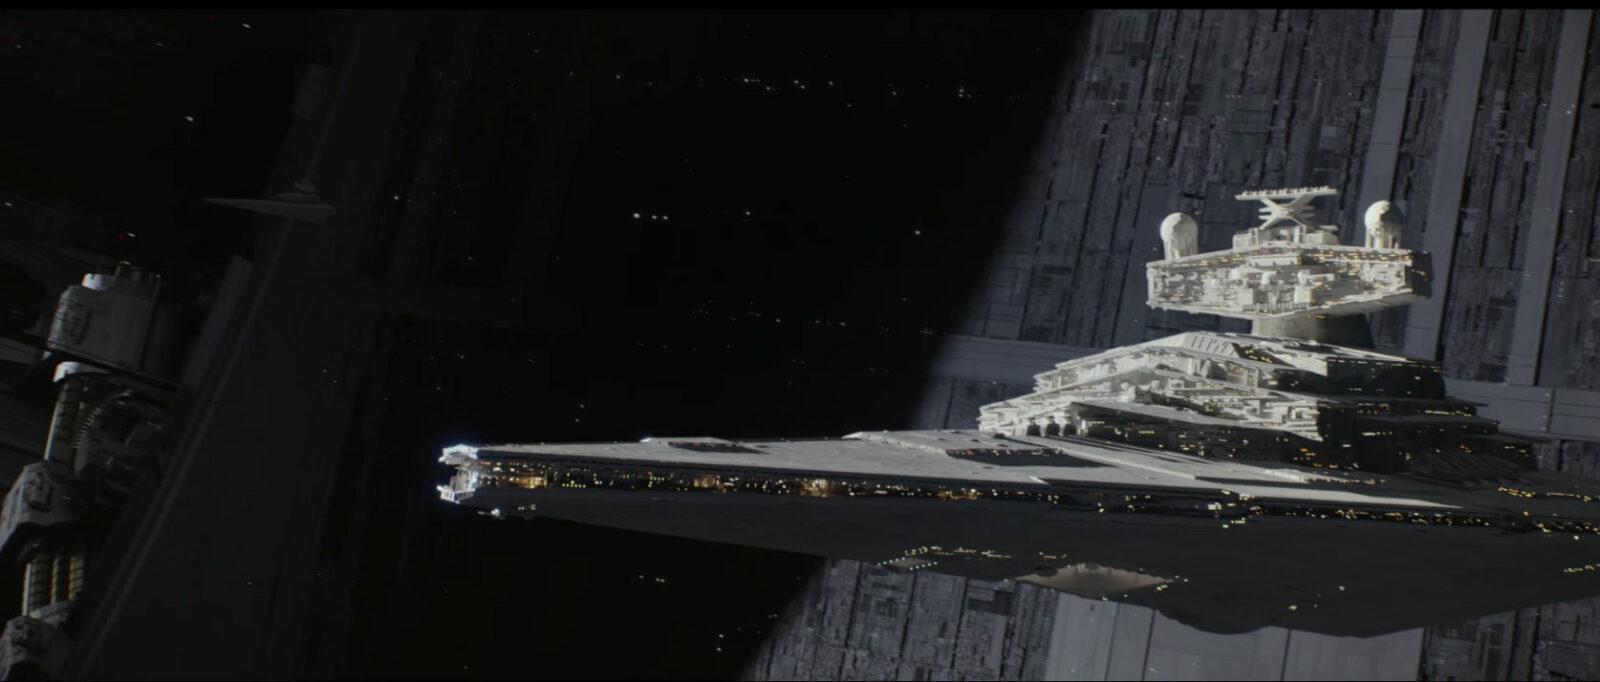 New Star Wars Film – Rogue One